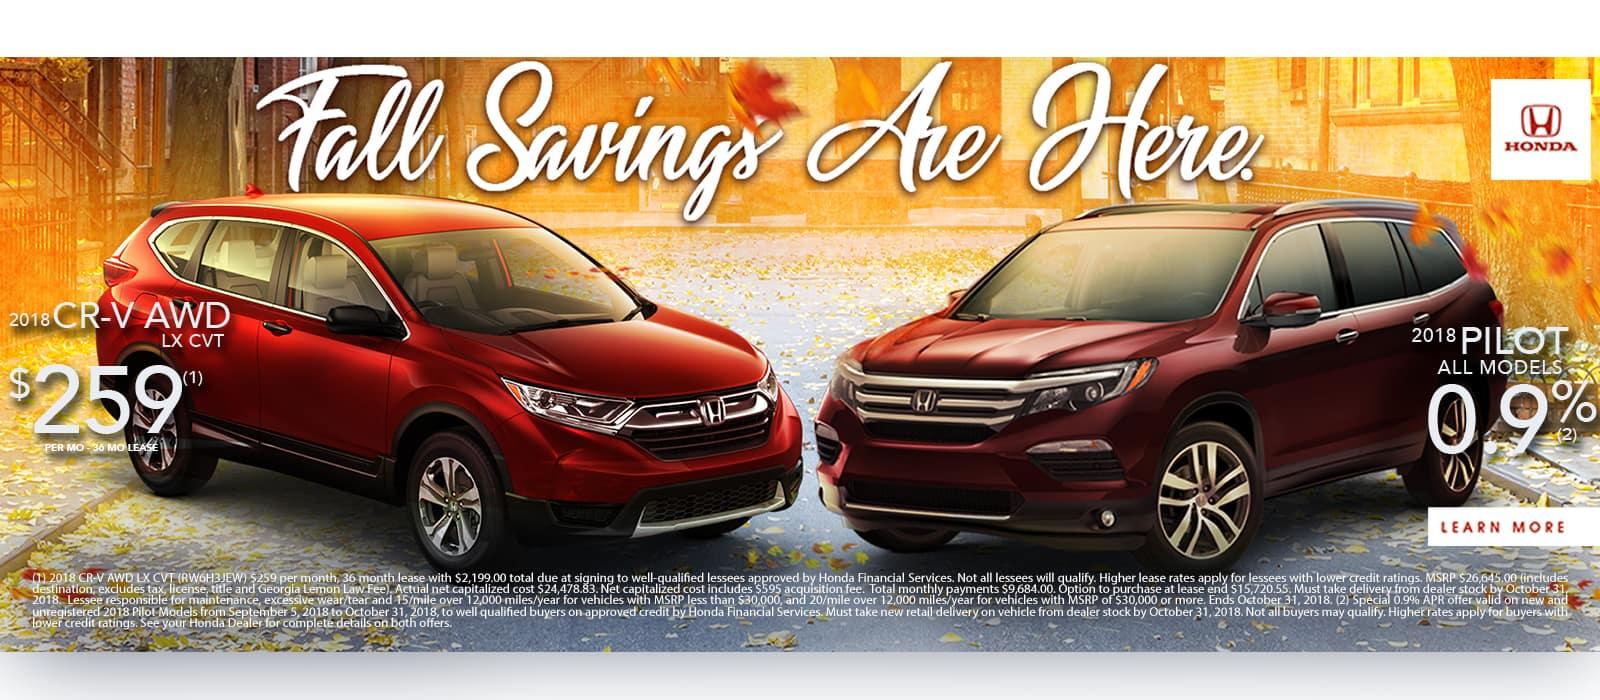 Honda And Used Car Dealer Greeley, CO | Honda Of Greeley